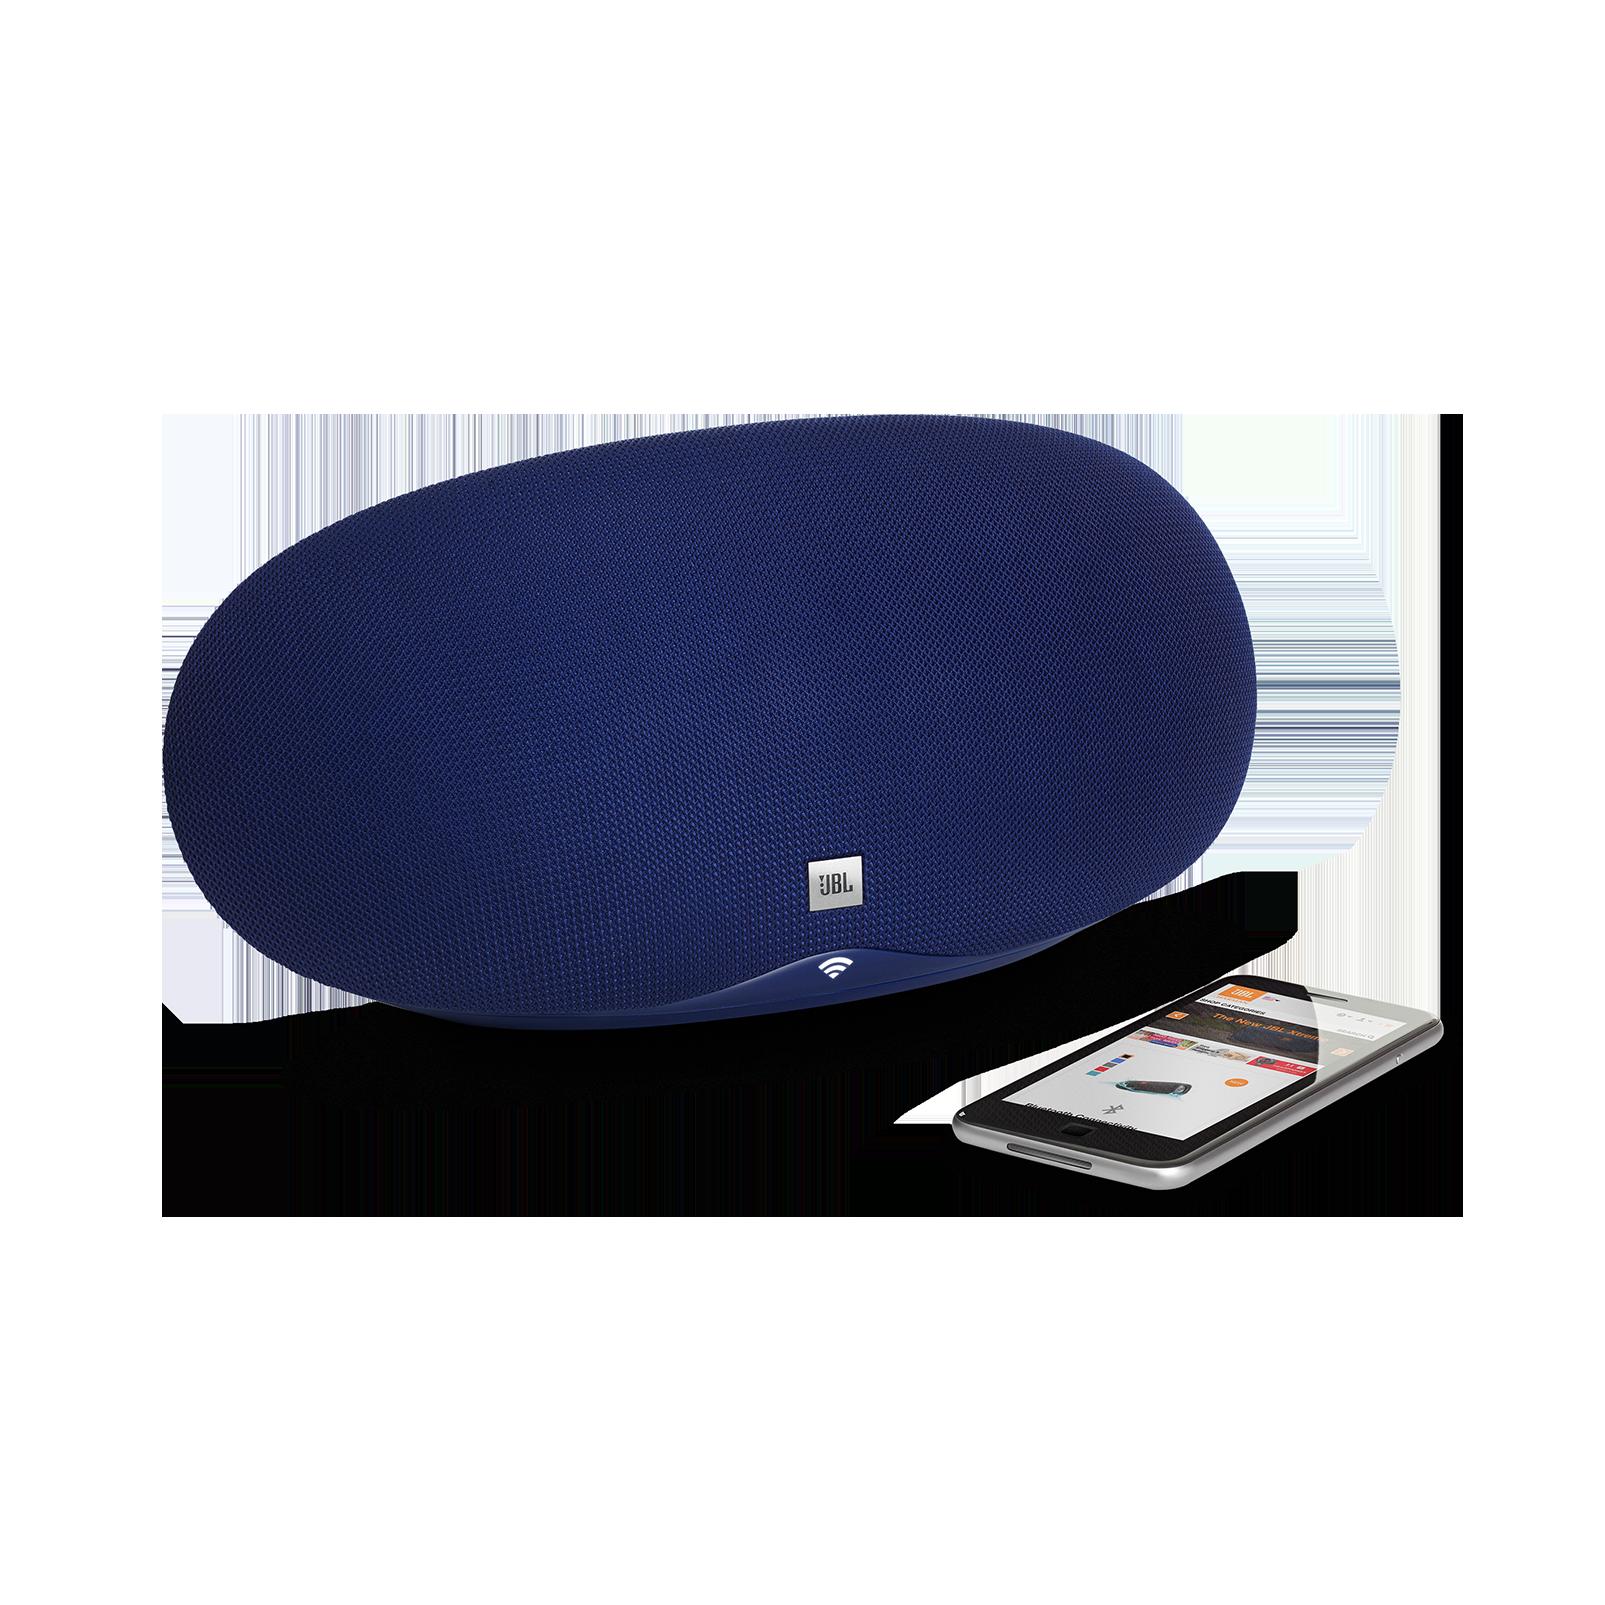 JBL Playlist - Blue - Wireless speaker with Chromecast built-in - Detailshot 1